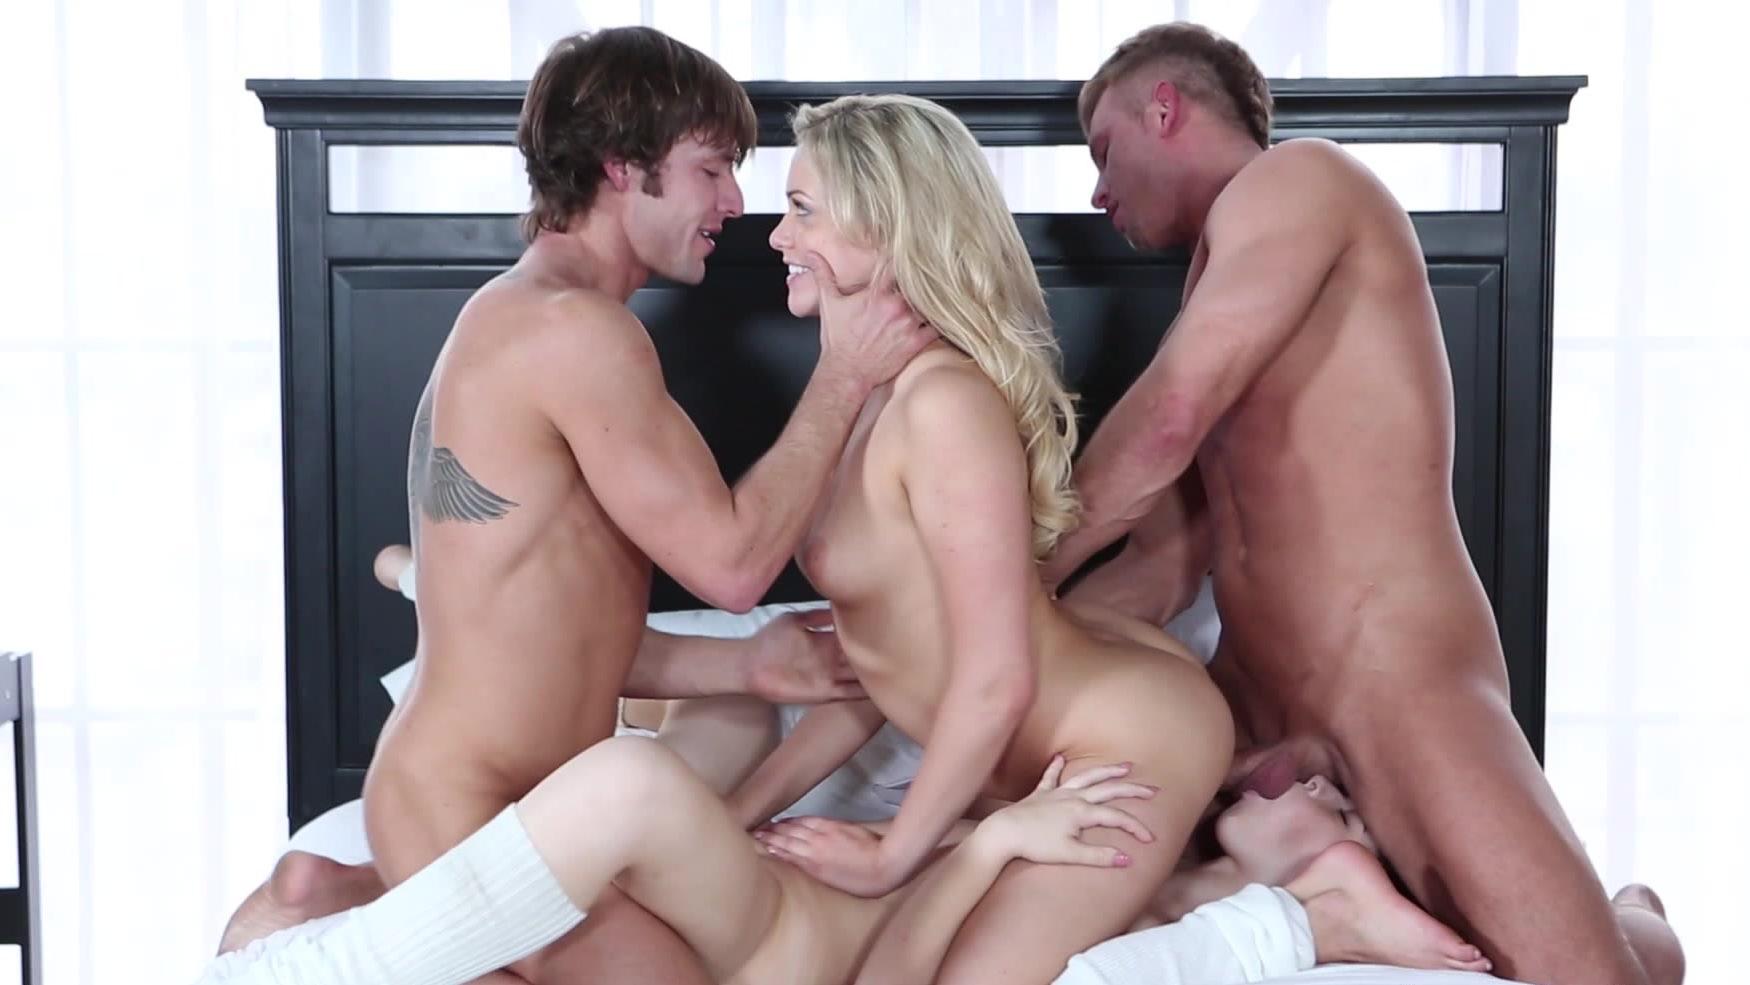 Mia Malkova Aubrey James - Best Porn Images, Free XXX Photos and ...